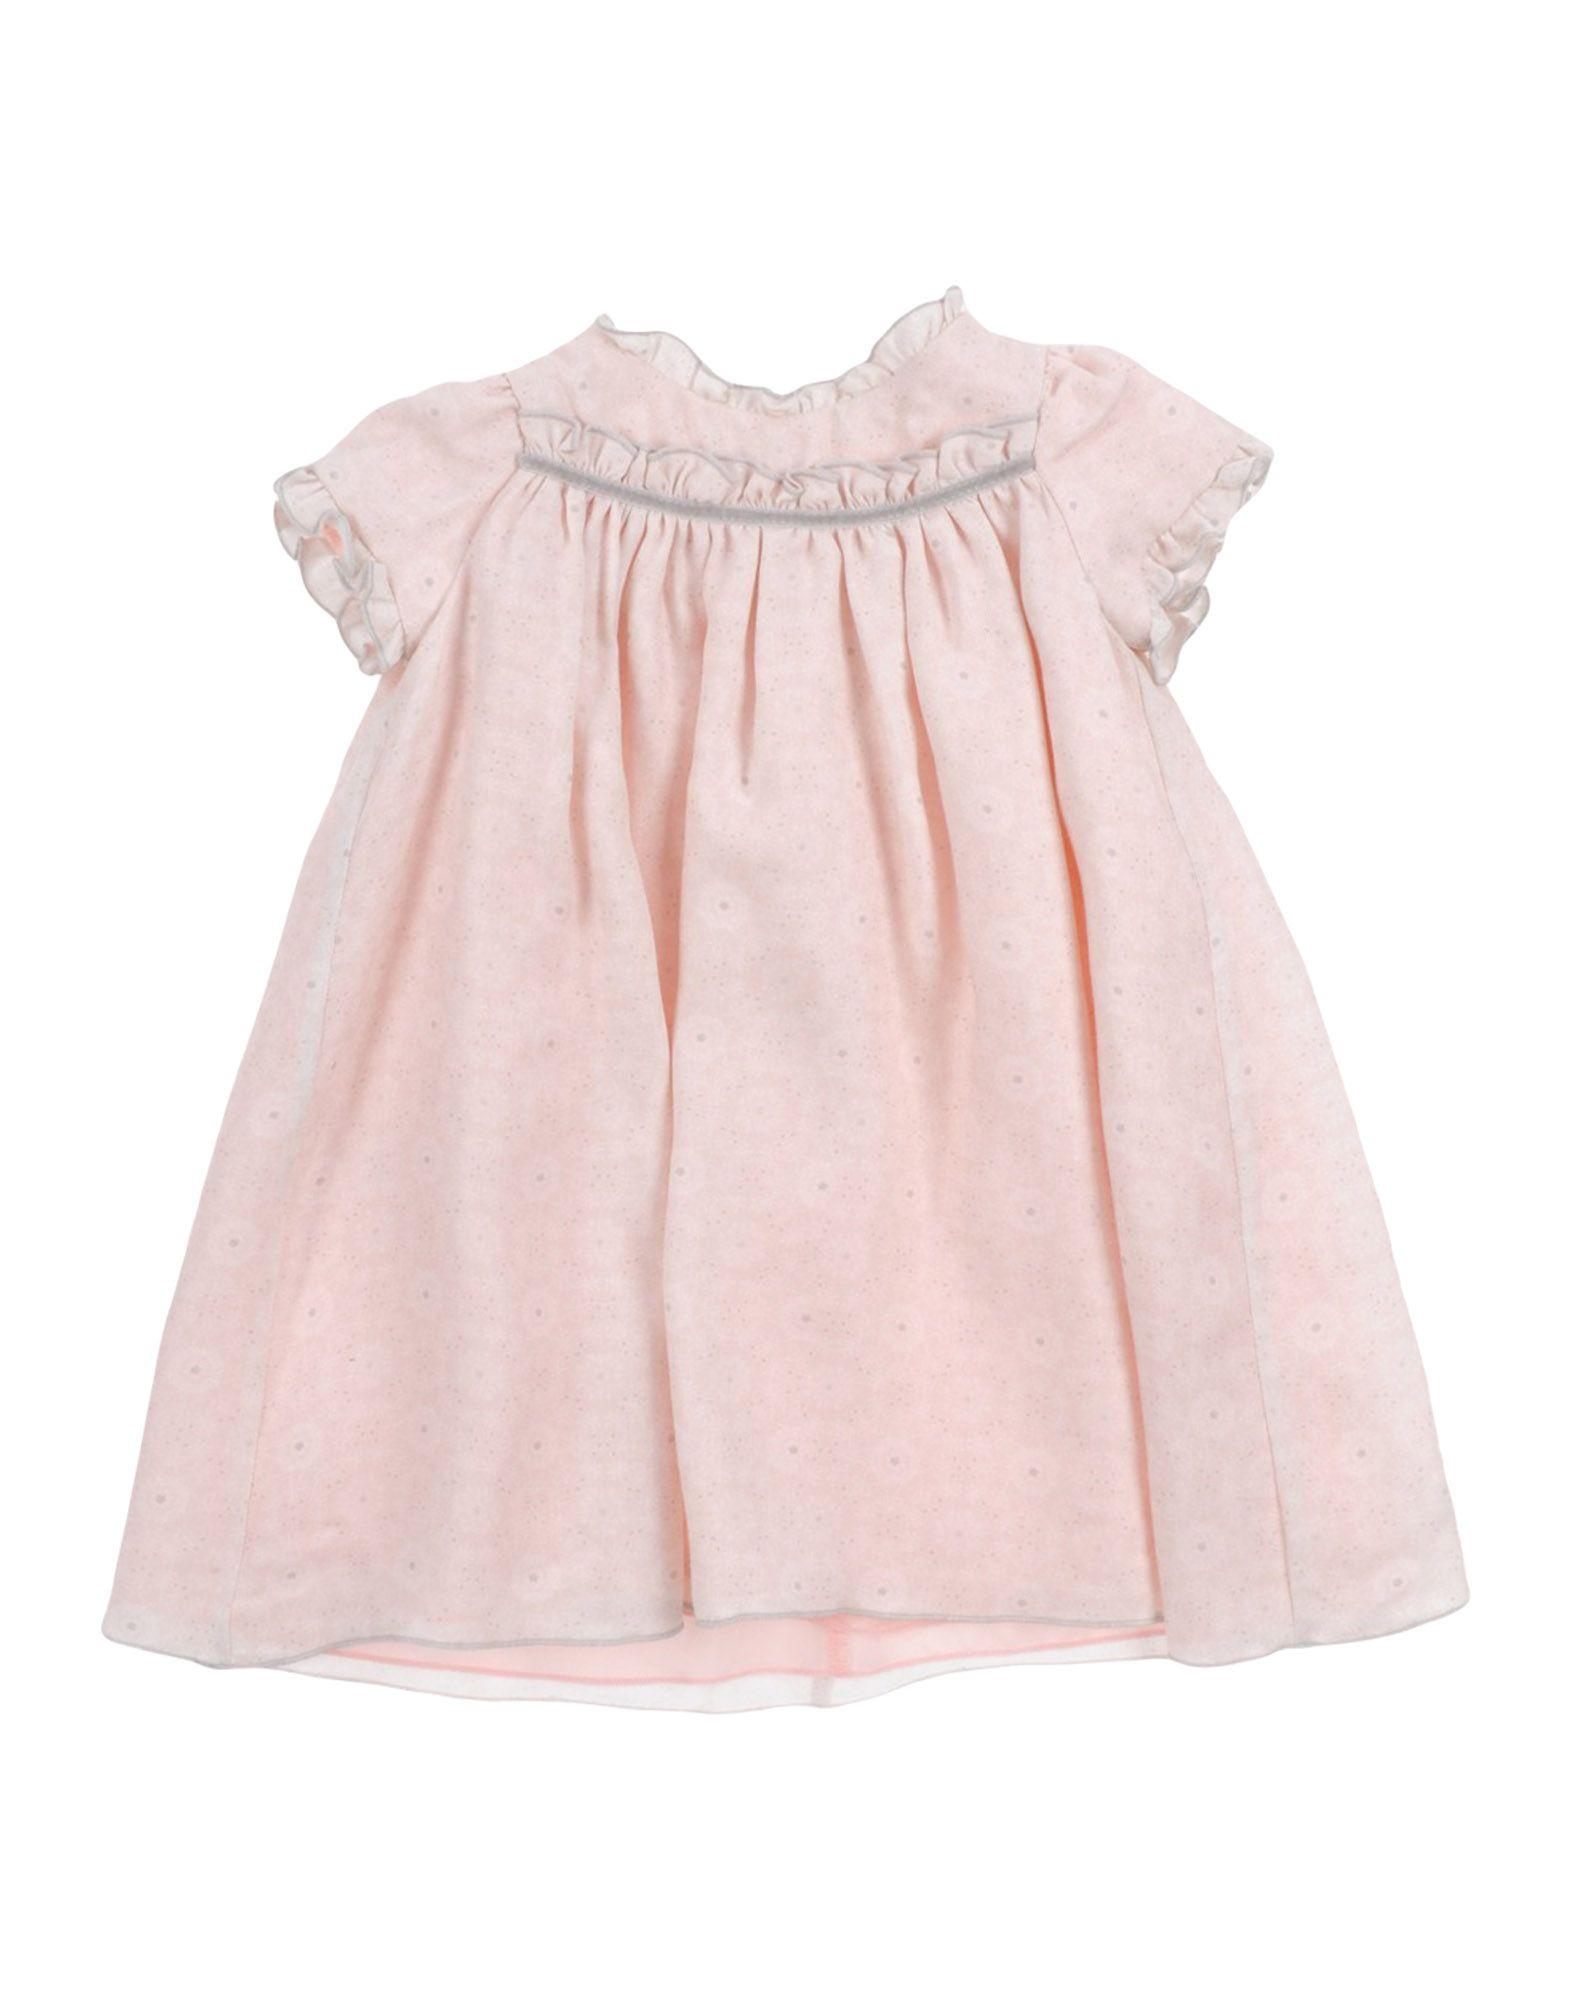 LA STUPENDERIA Dress in Light Pink